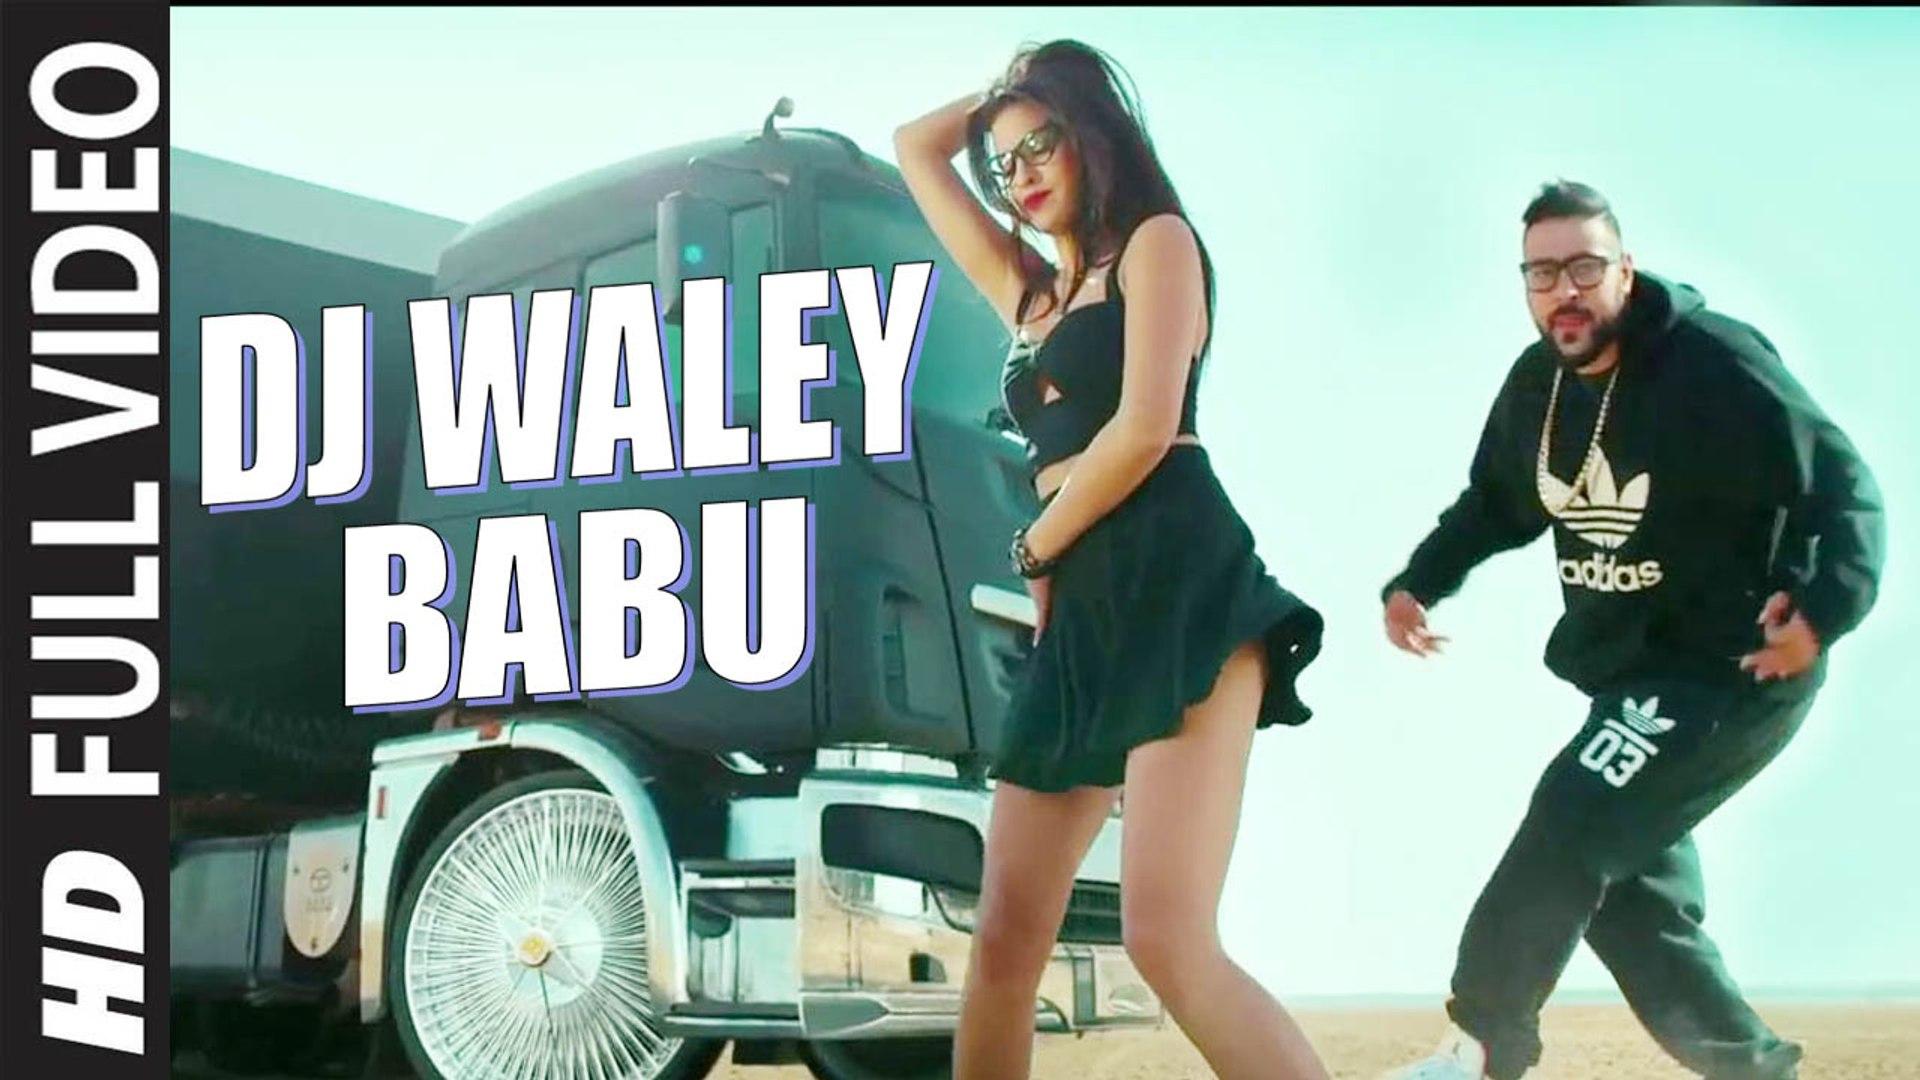 DJ Waley Babu (Full Video) Badshah ft Aastha Gill   Hot & Sexy New Punjabi  Song 2015 HD